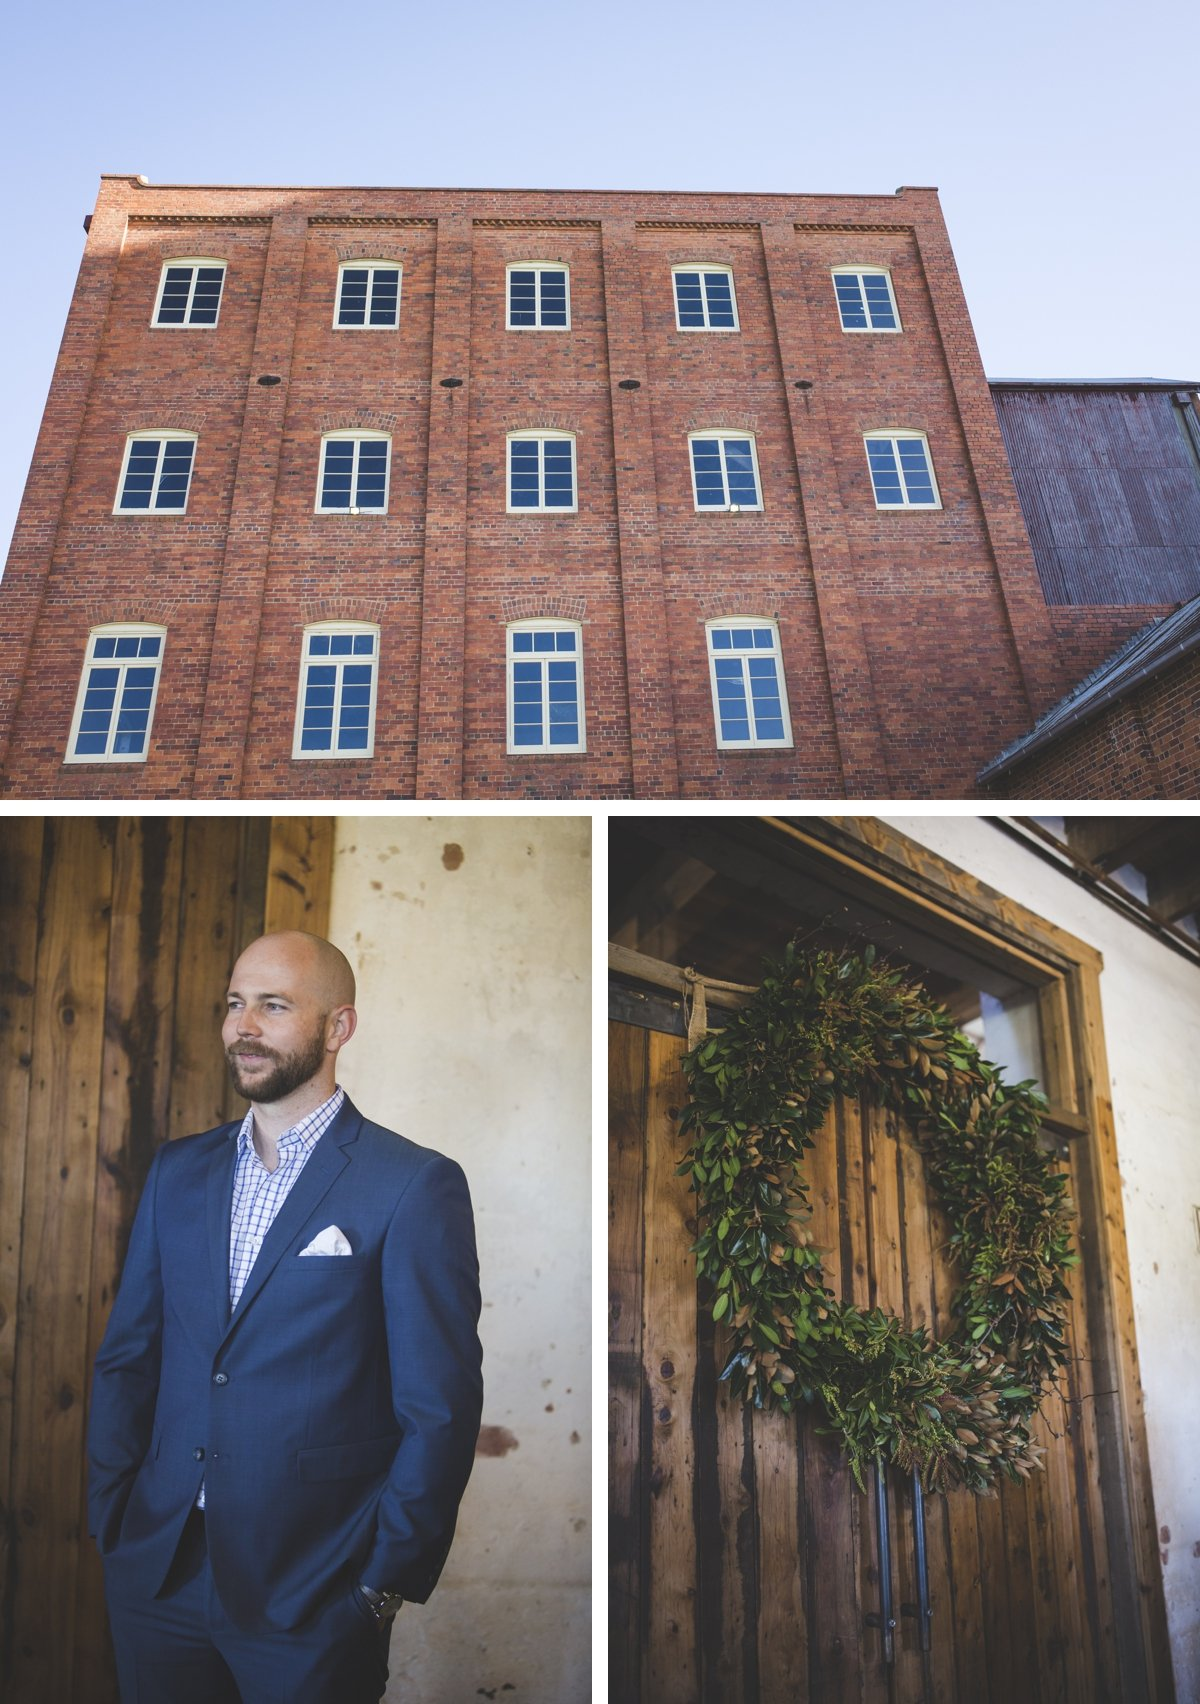 corowa whisky factory wedding venue wedding photographer206